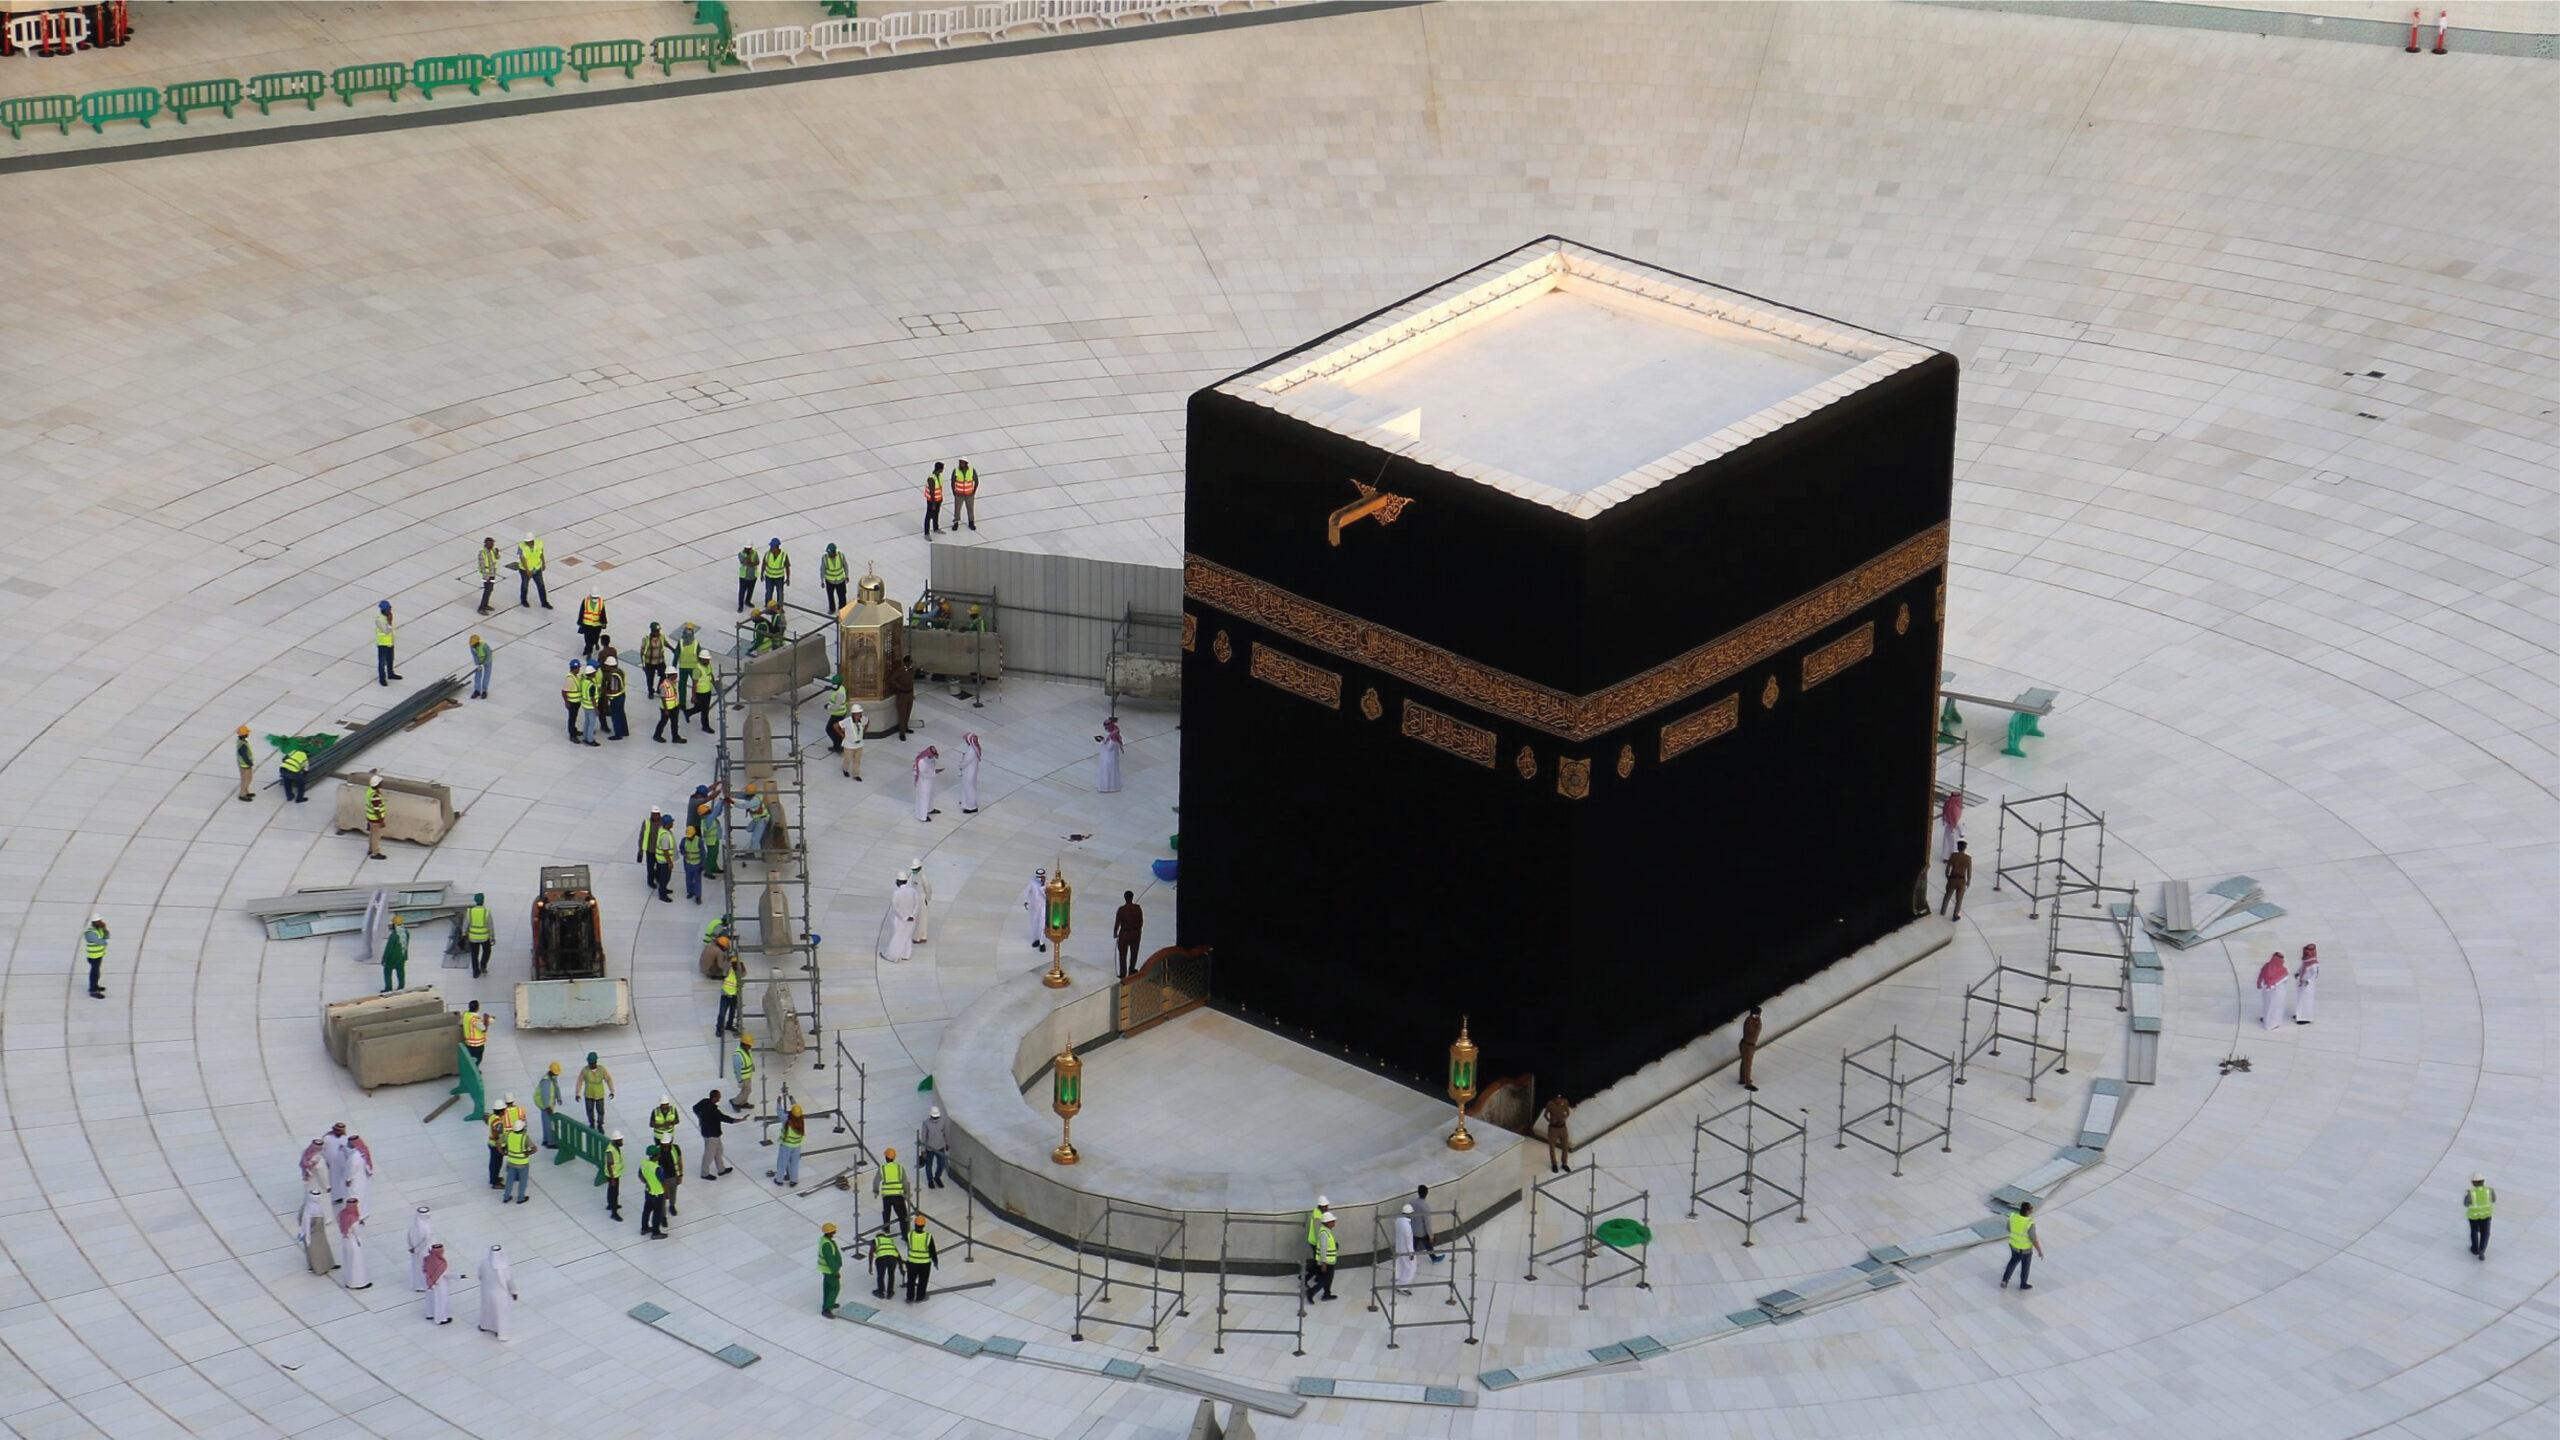 Saudi Arabia to allow vaccinated Umrah pilgrims from abroad